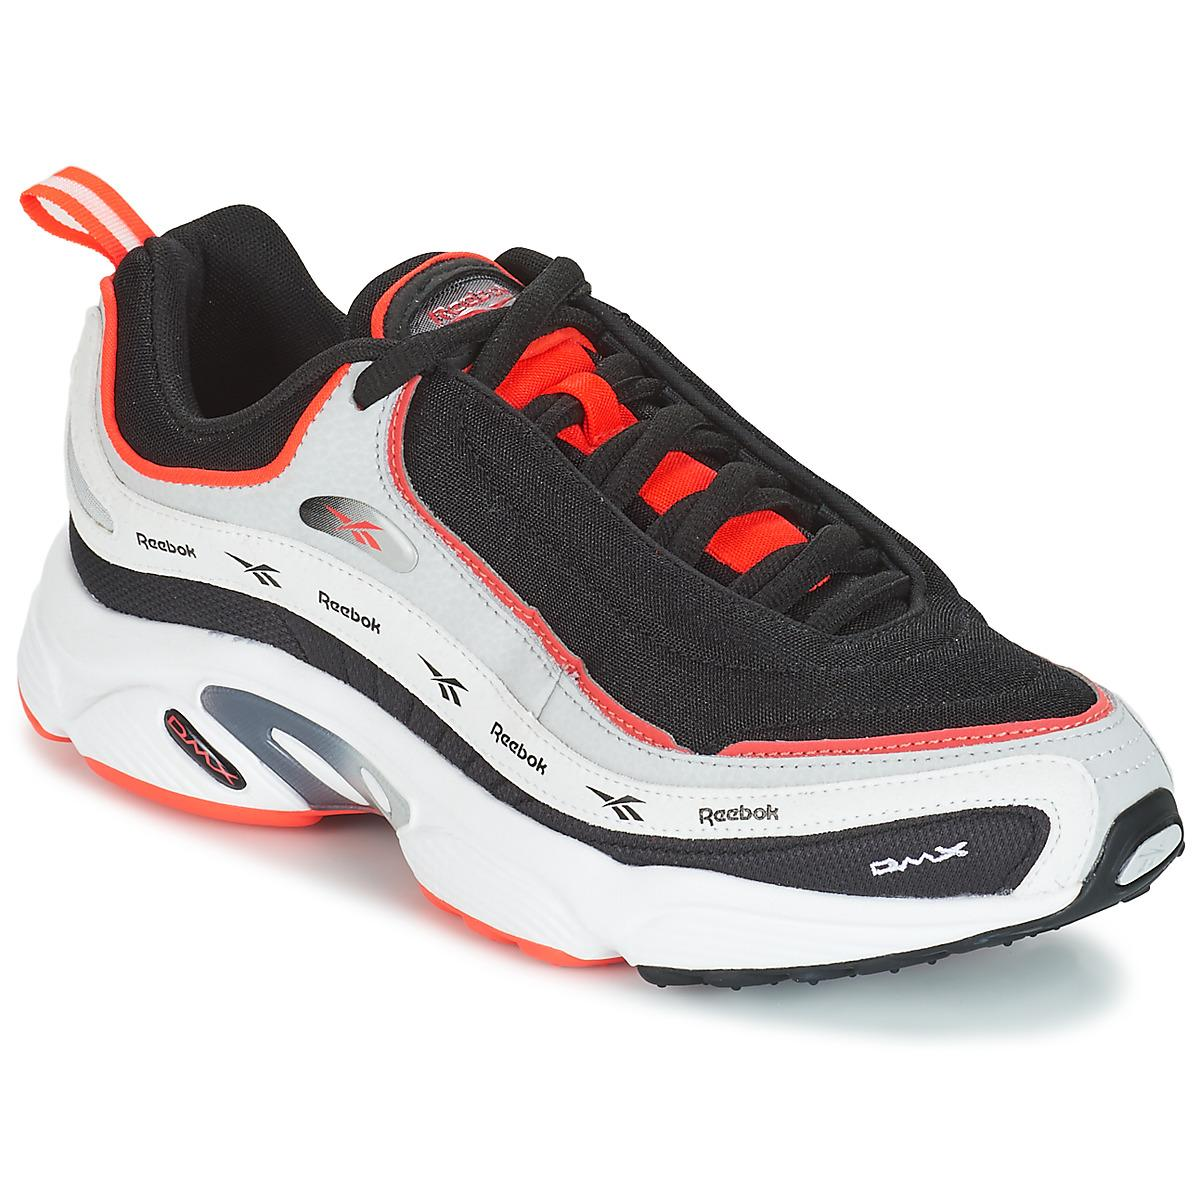 1a25f2a1a0da Reebok - Gray Daytona Dmx Vector Shoes (trainers) for Men - Lyst. View  fullscreen